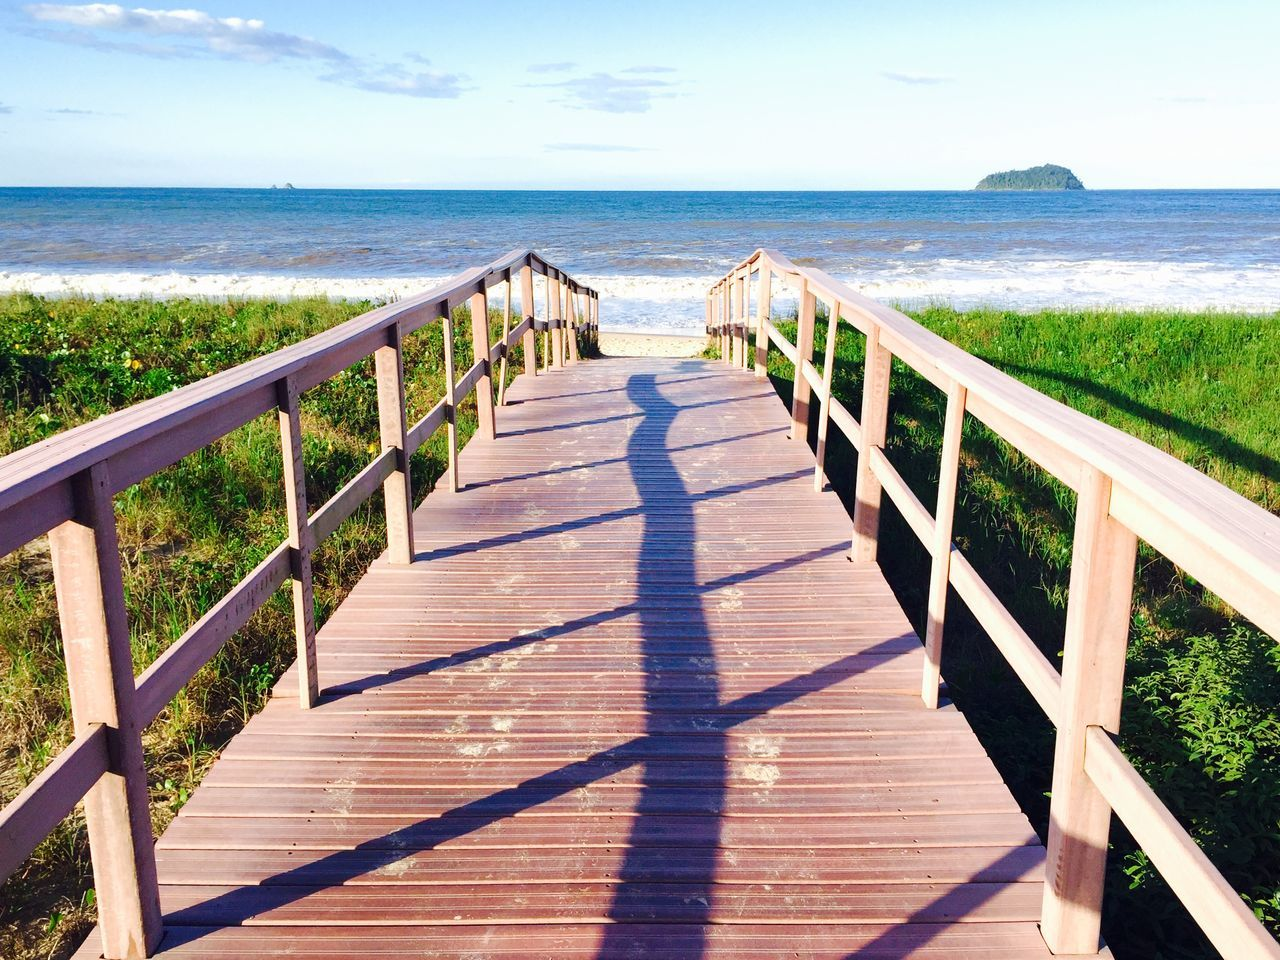 Beautiful stock photos of brazil, horizon over water, sea, water, beach